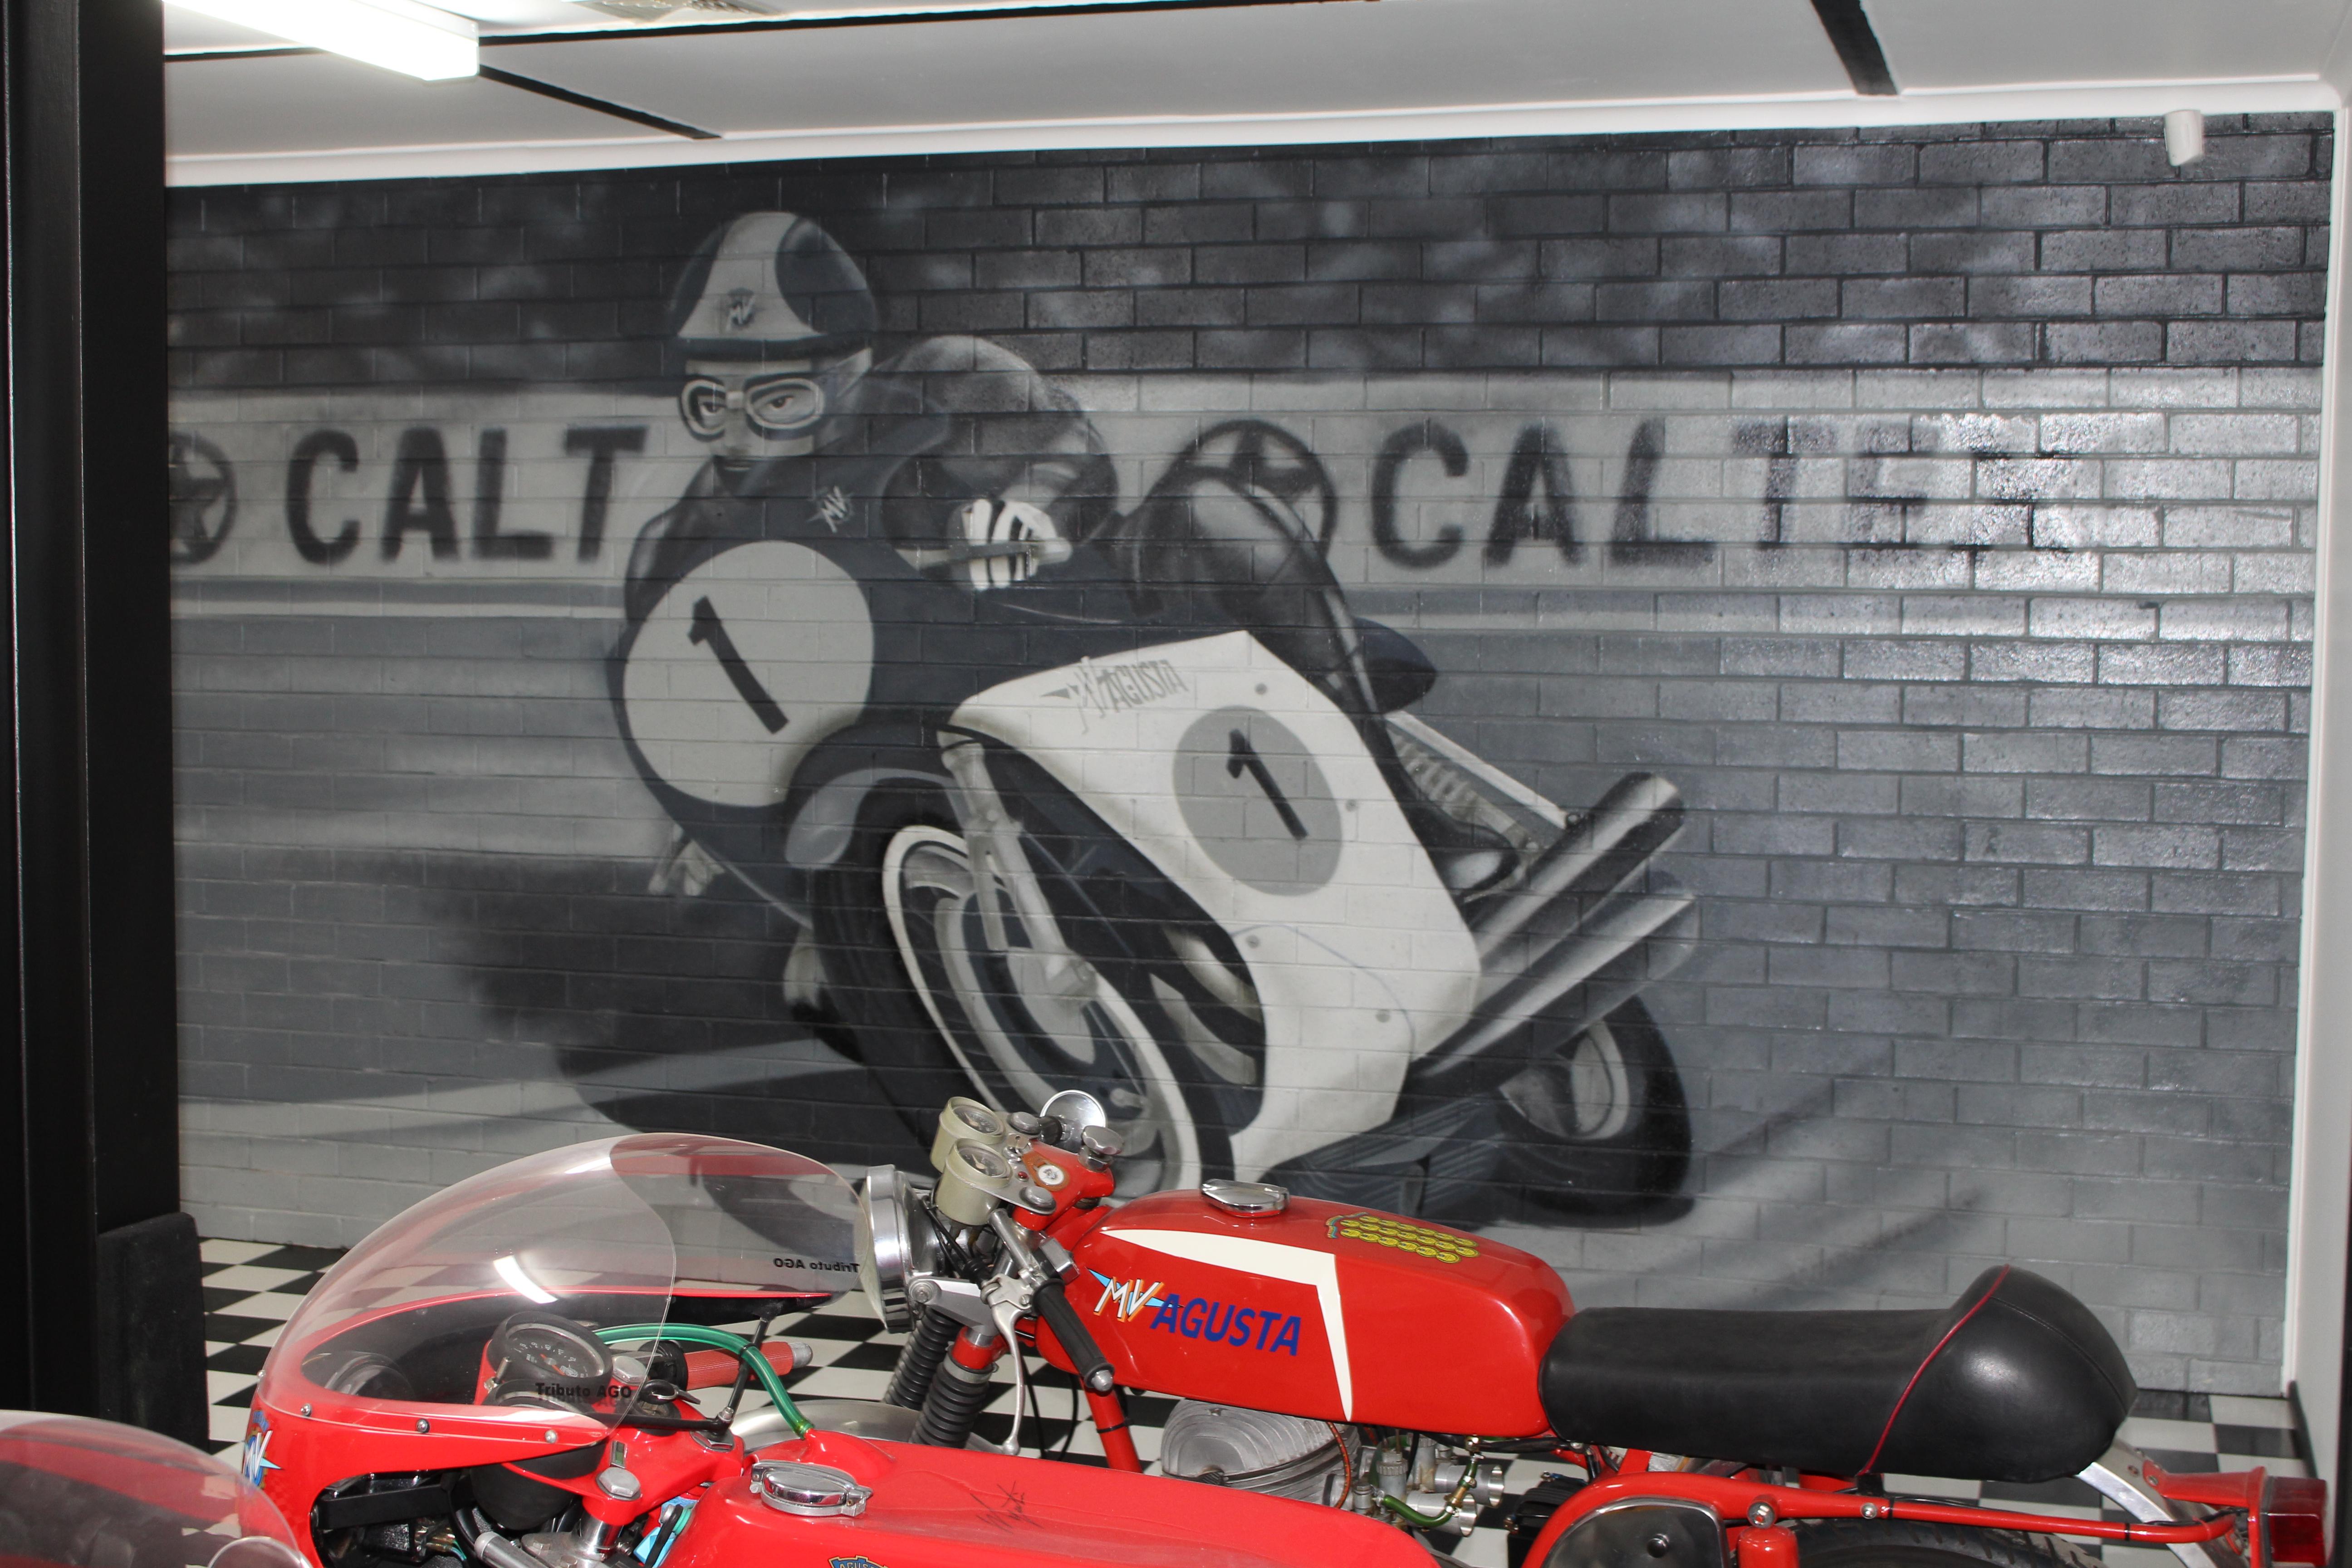 MV Agusta motorcyle mural